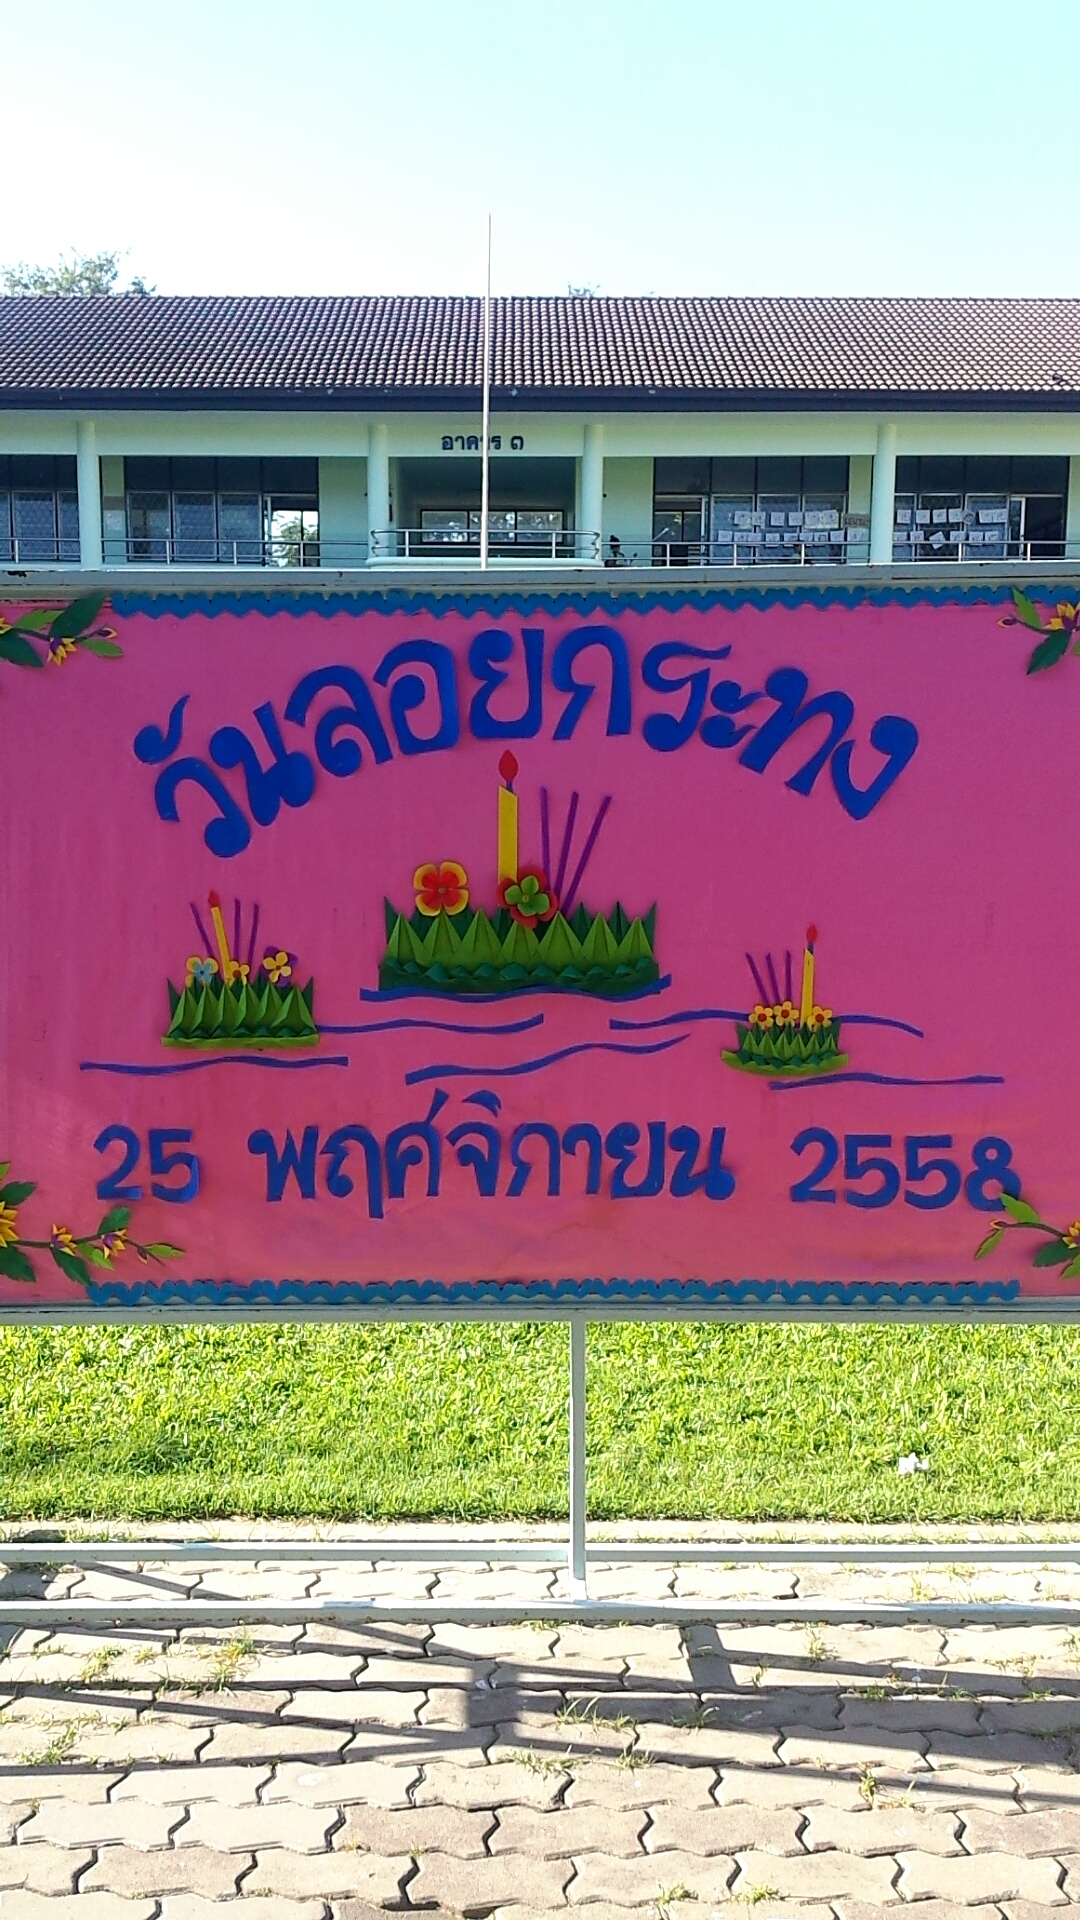 Happy Loy Krathong!